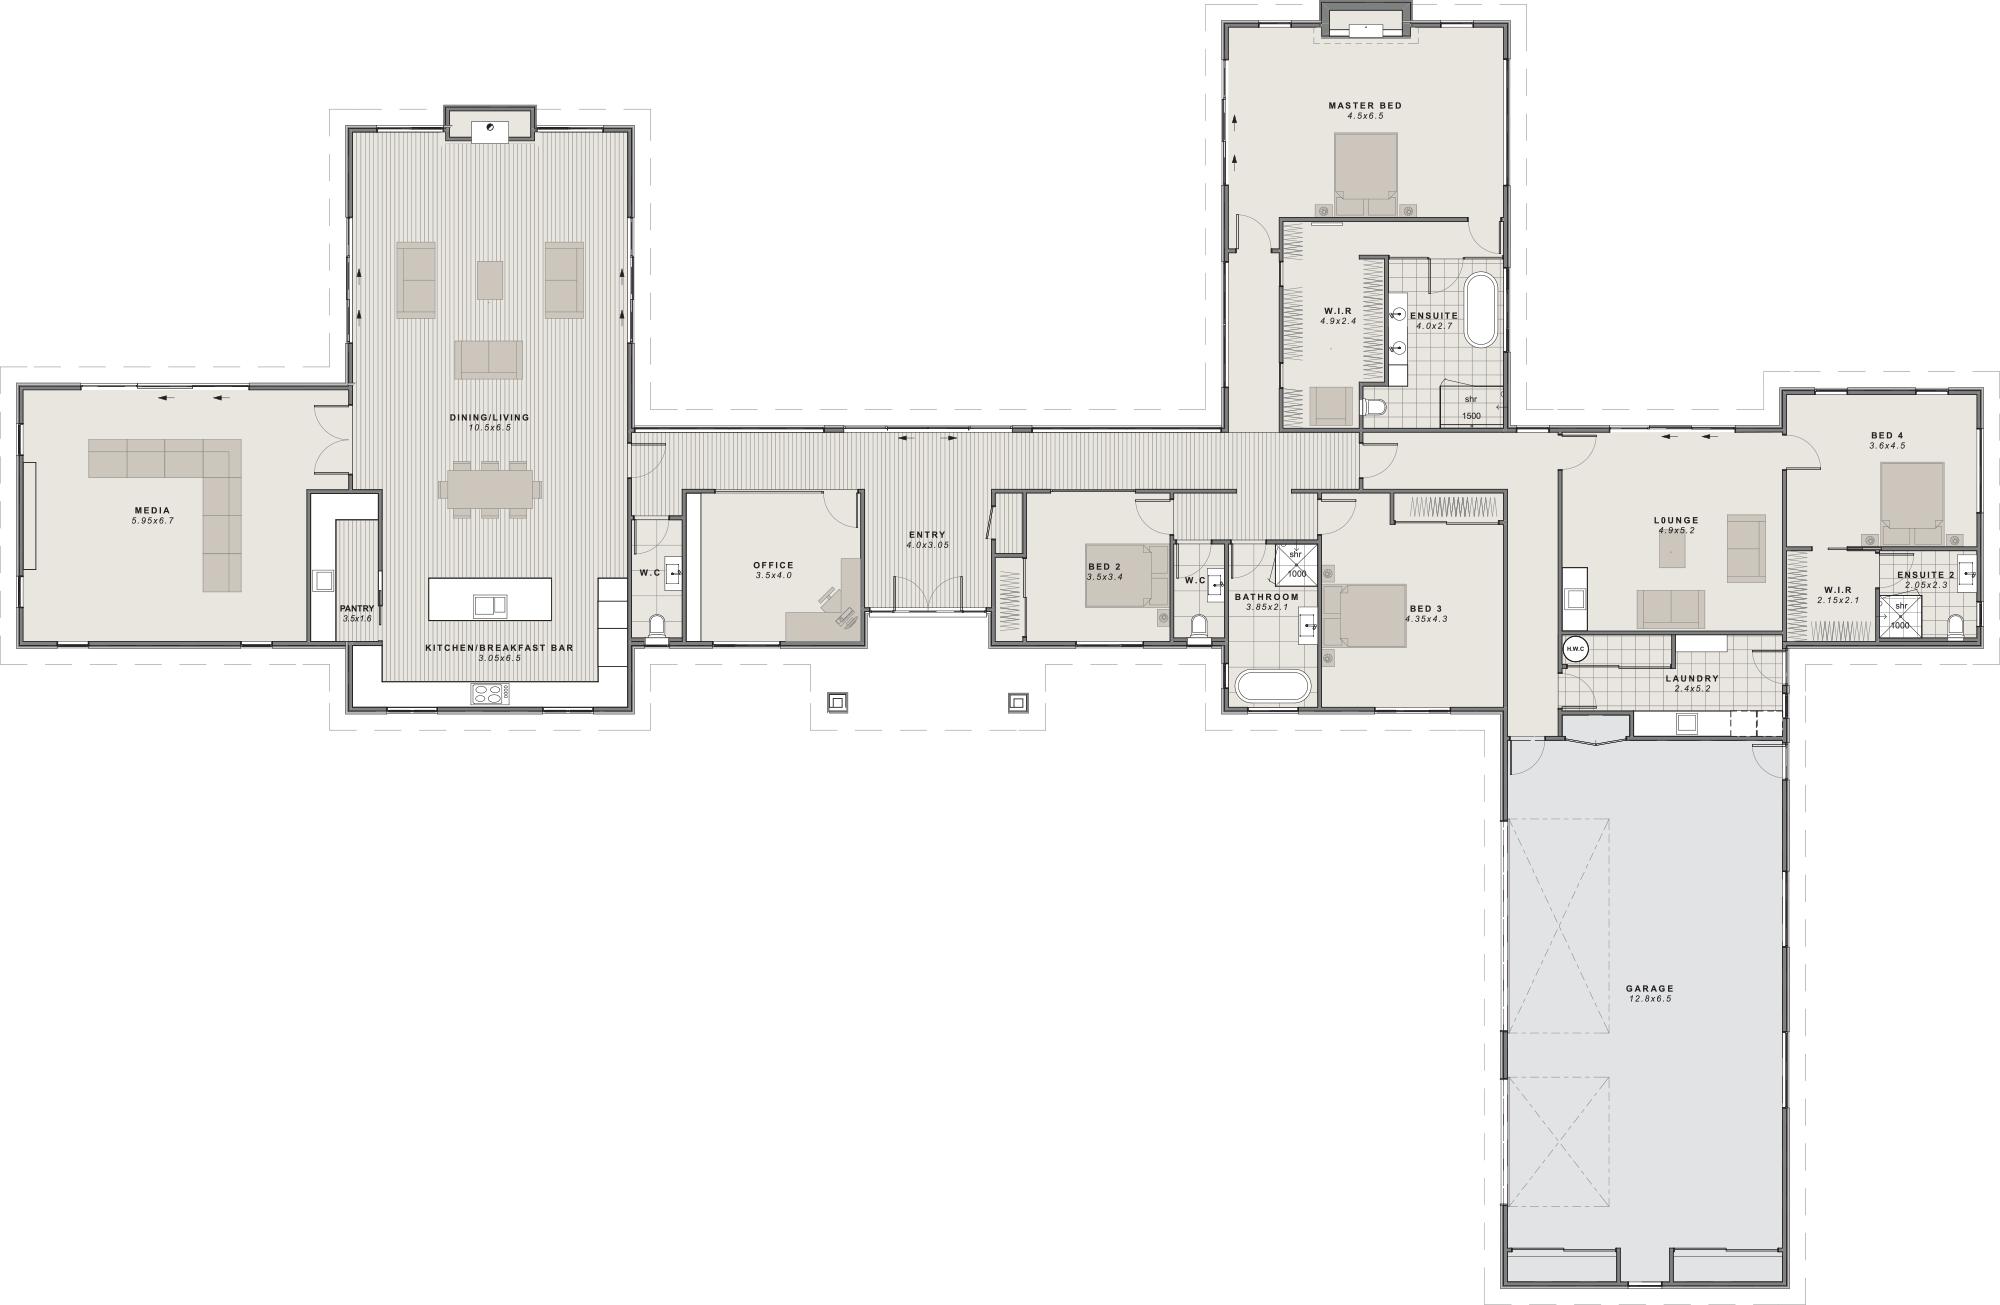 The Molesworth Floor plan